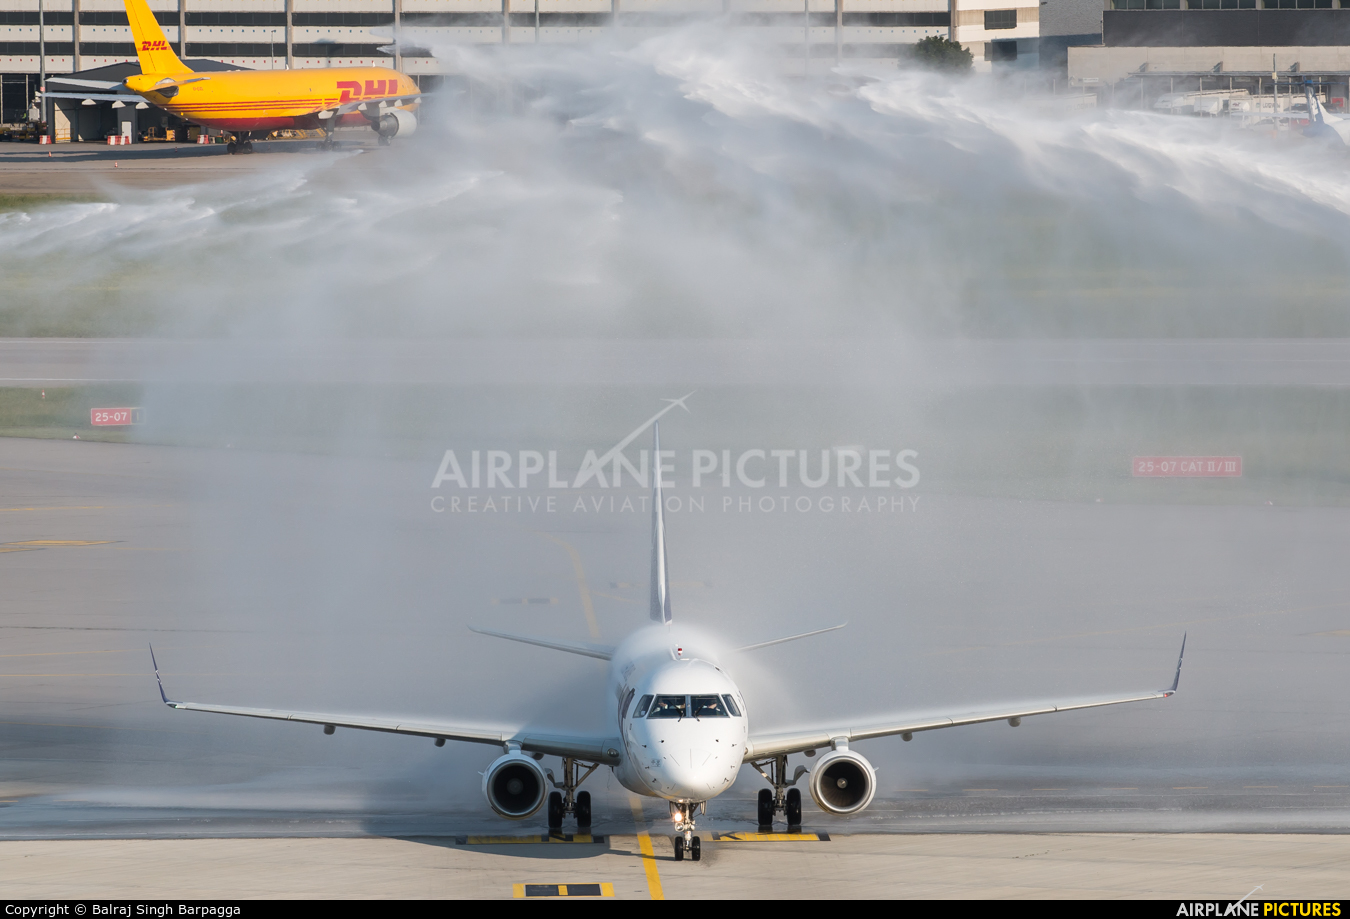 LOT - Polish Airlines SP-LID aircraft at Stuttgart